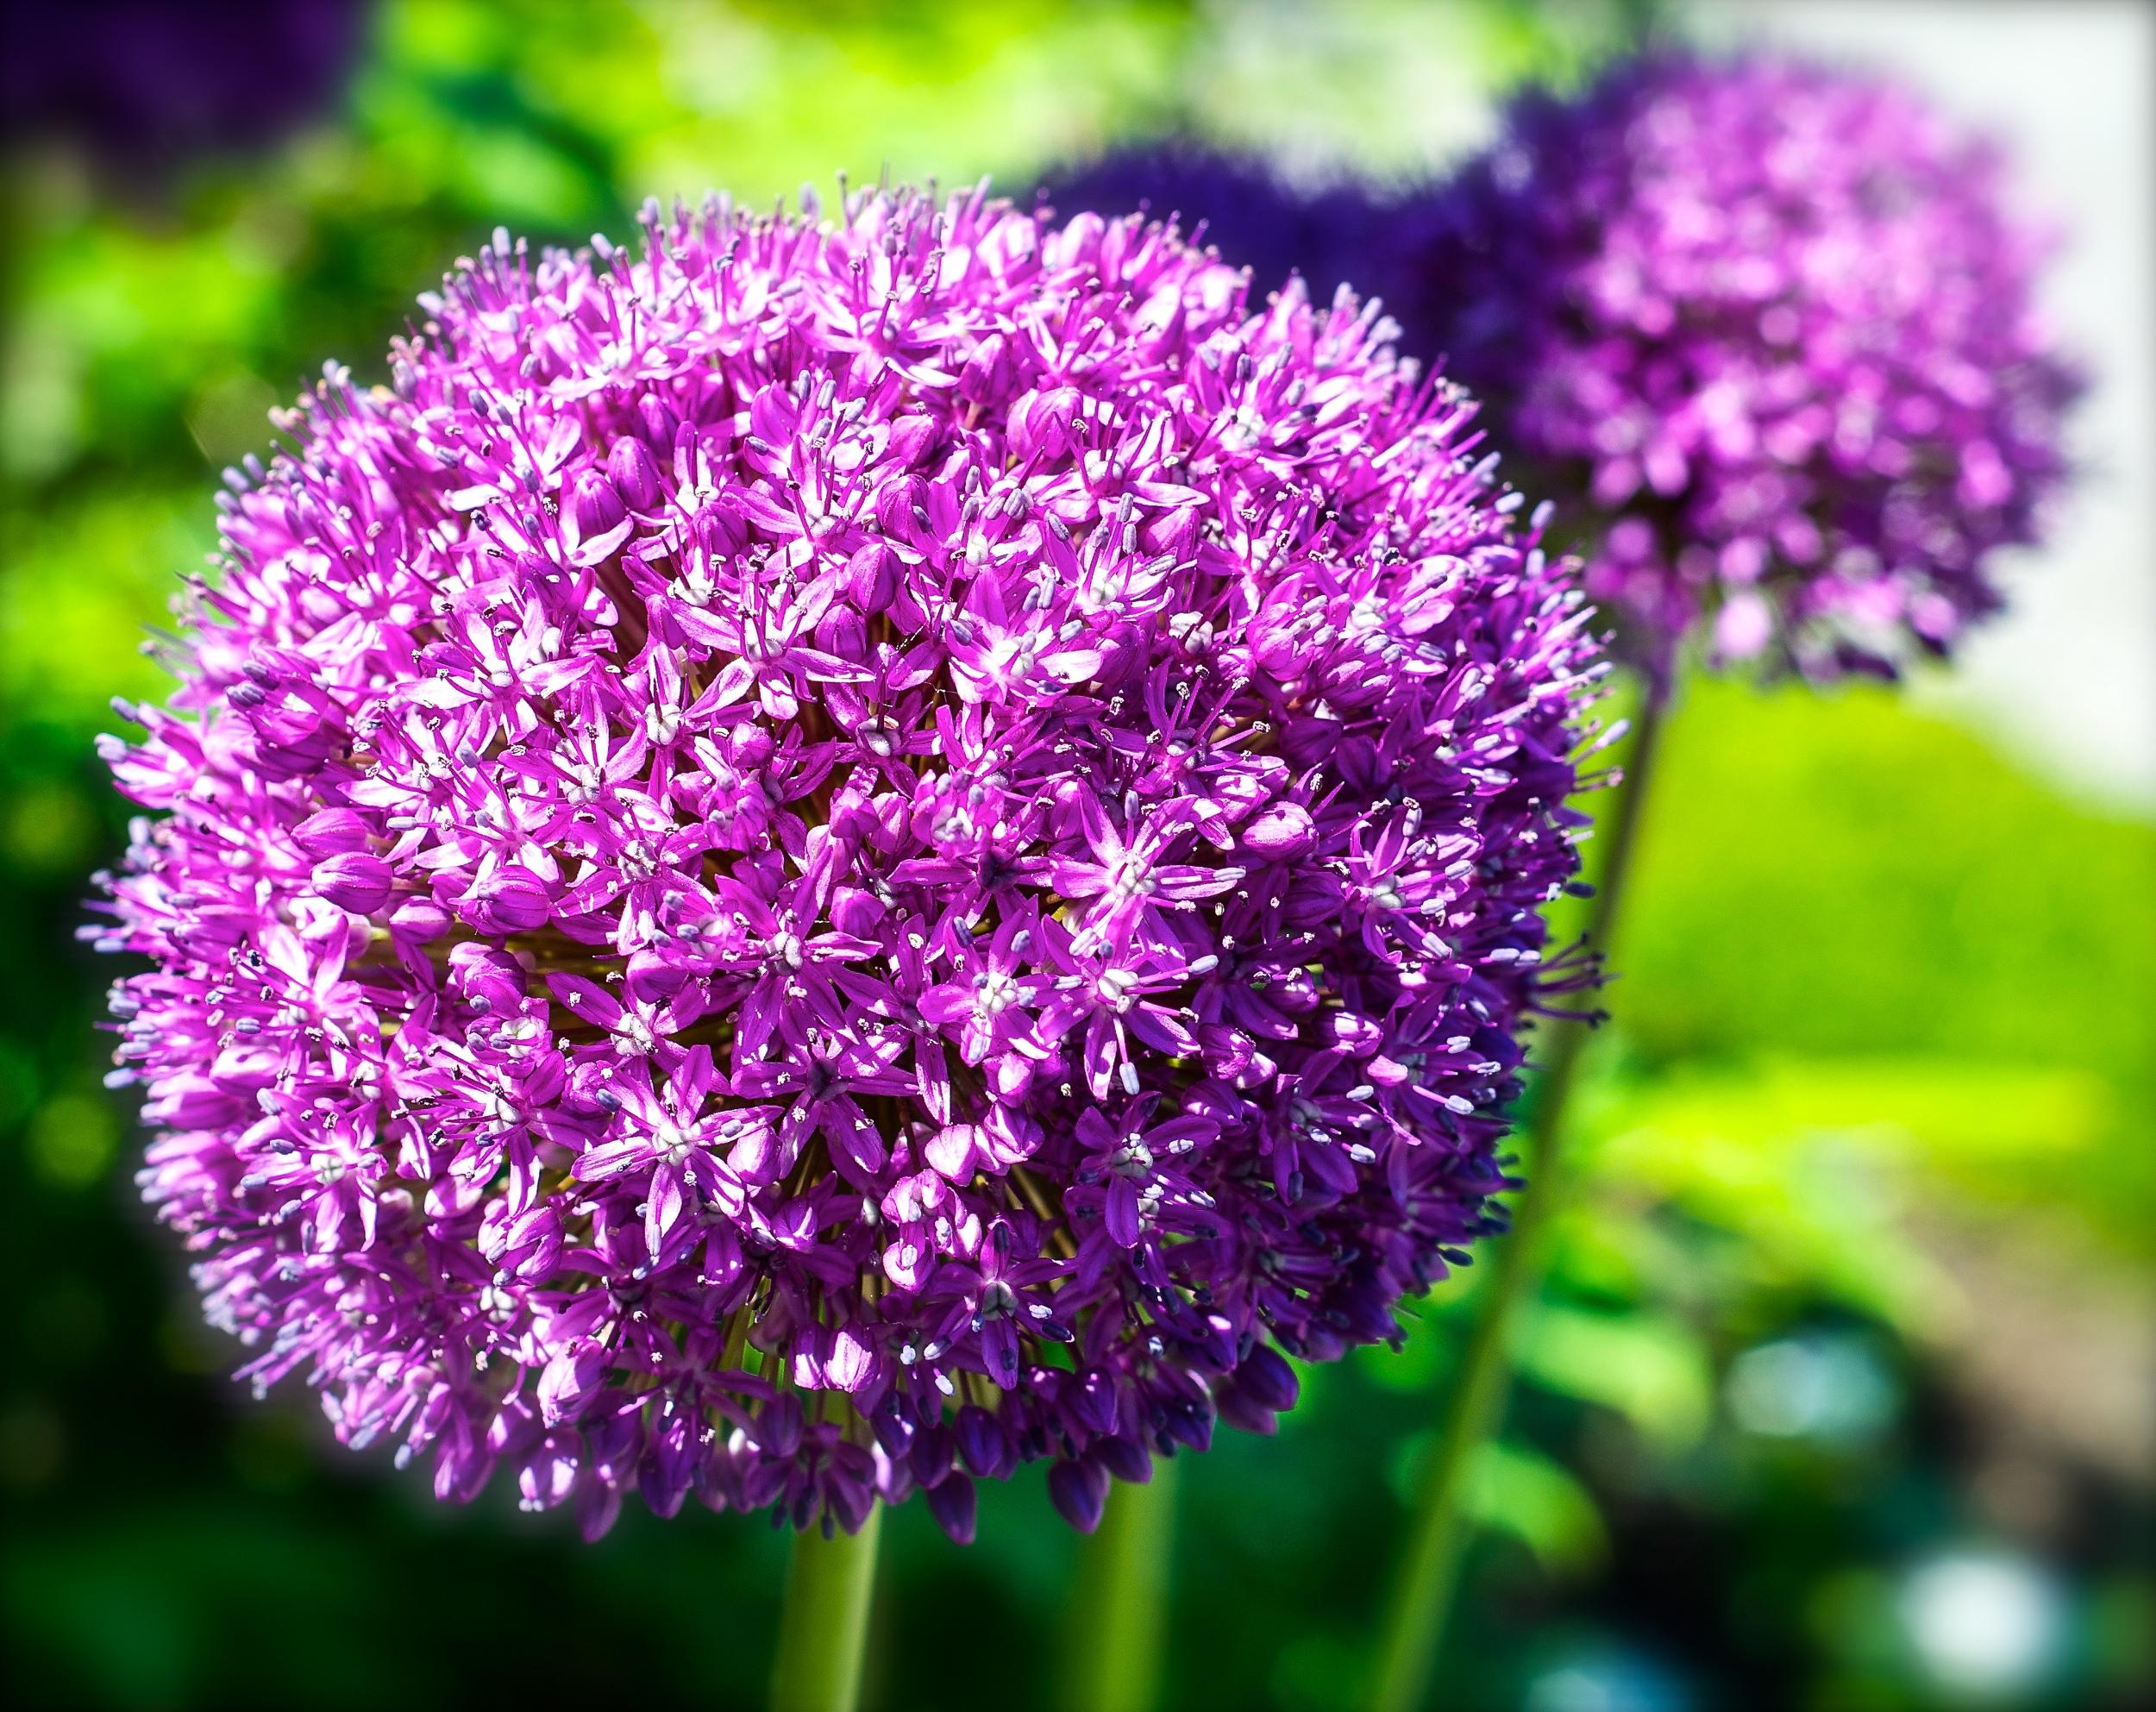 @ Flowers-LR.jpg.jpg